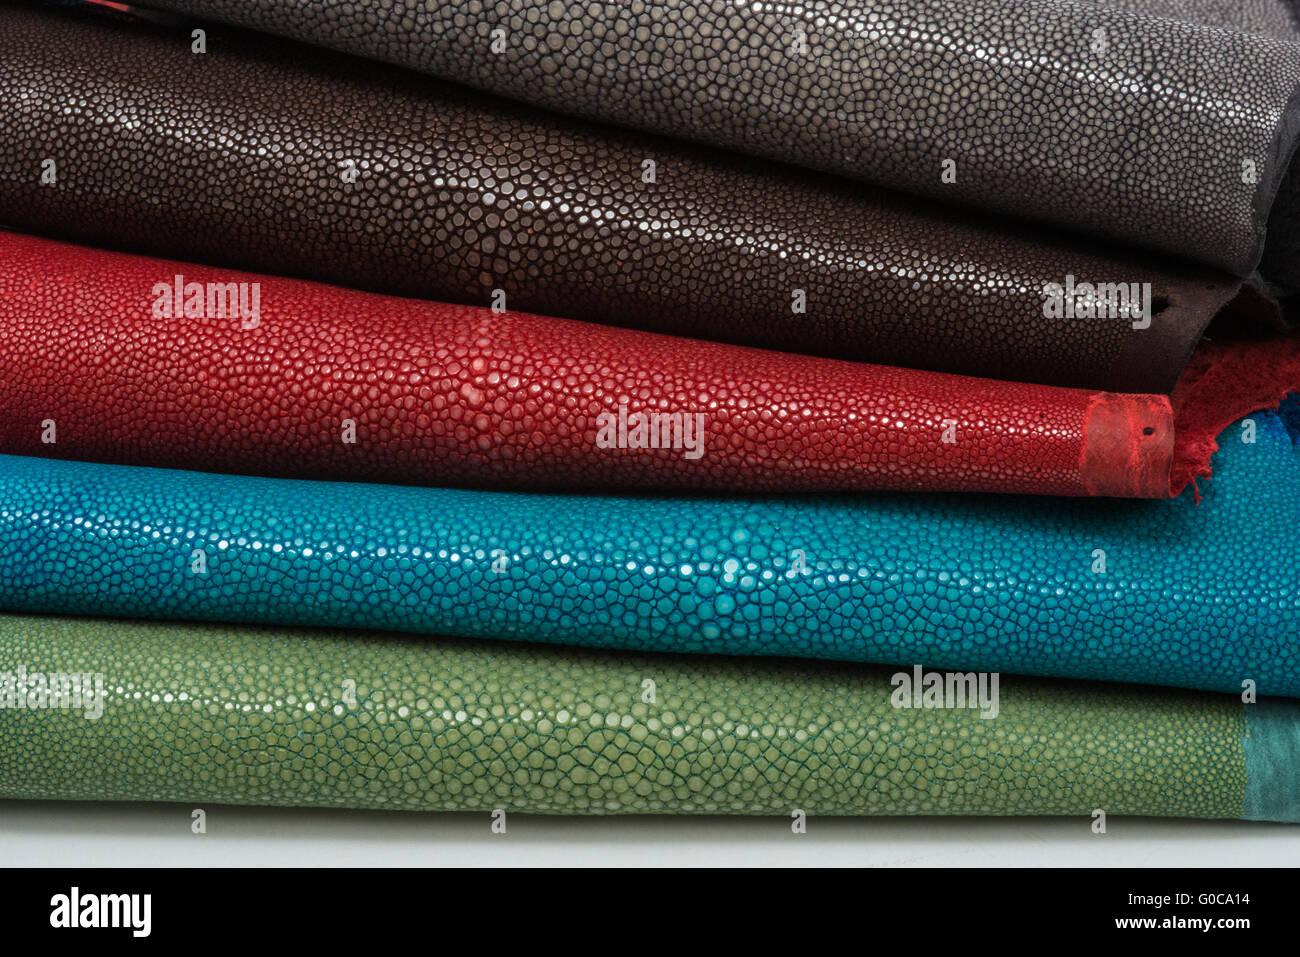 Stingray Exotic Leather Stockfotos & Stingray Exotic Leather Bilder ...